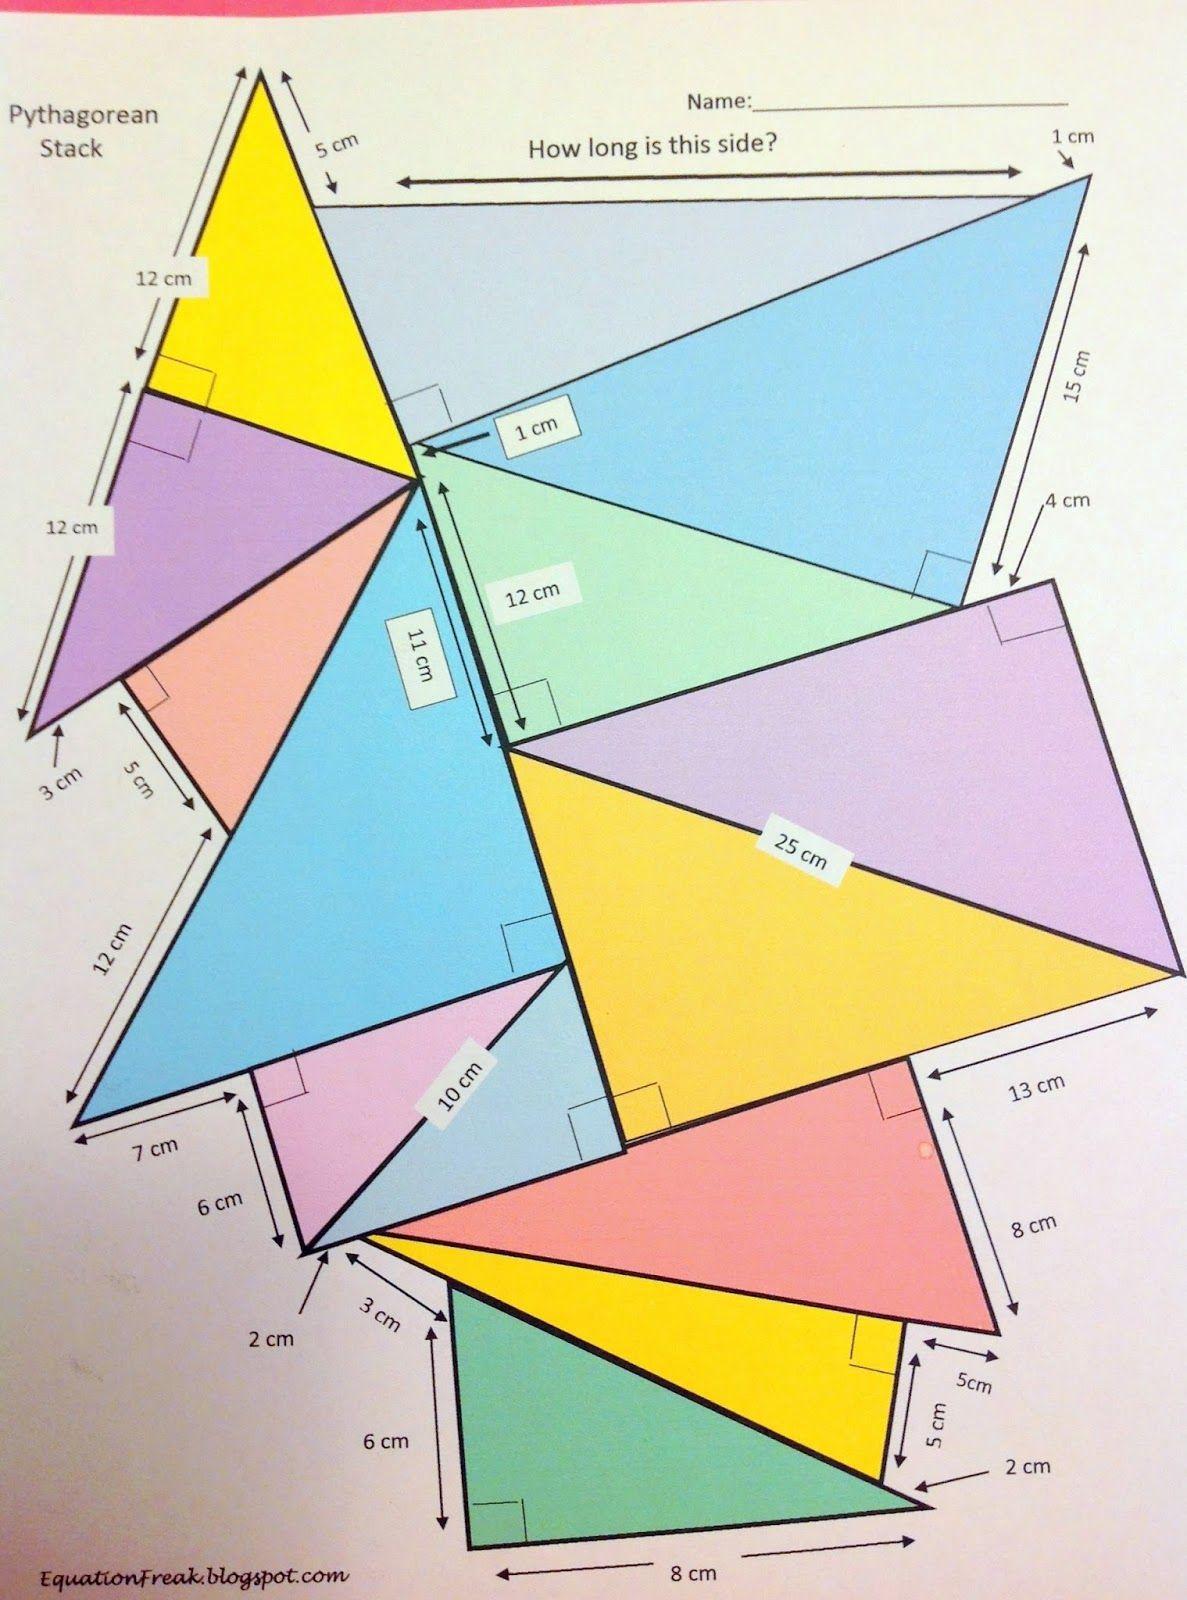 Pythagorean+Stacks+2.jpg (1187×1600) | 9th grade | Pinterest | Math ...